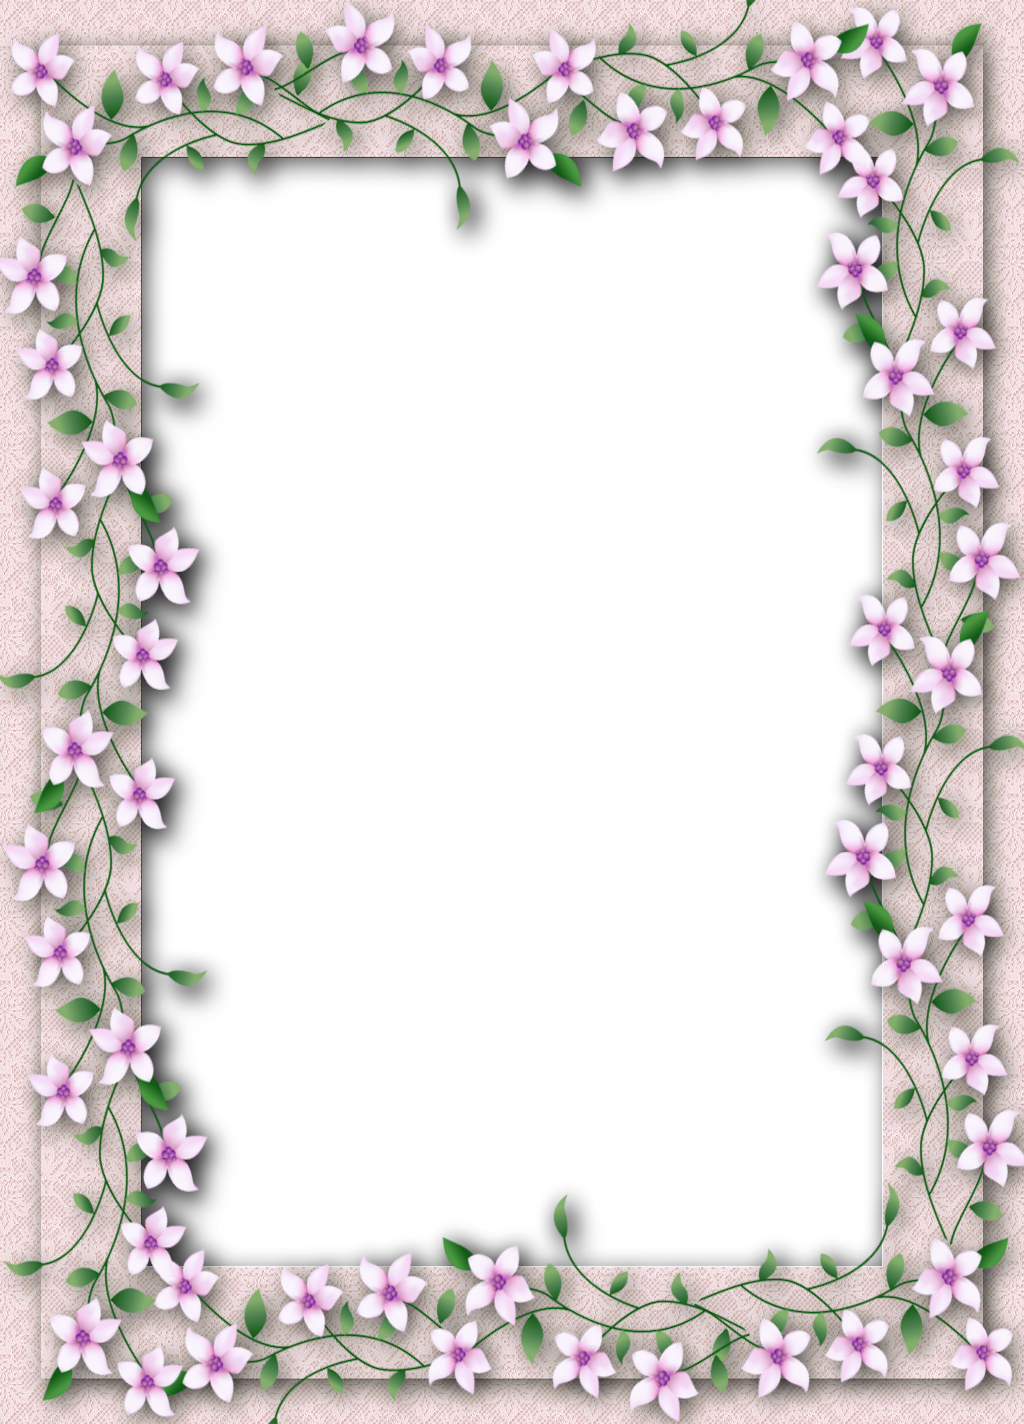 Frame png transparent. Delicate flower gallery yopriceville